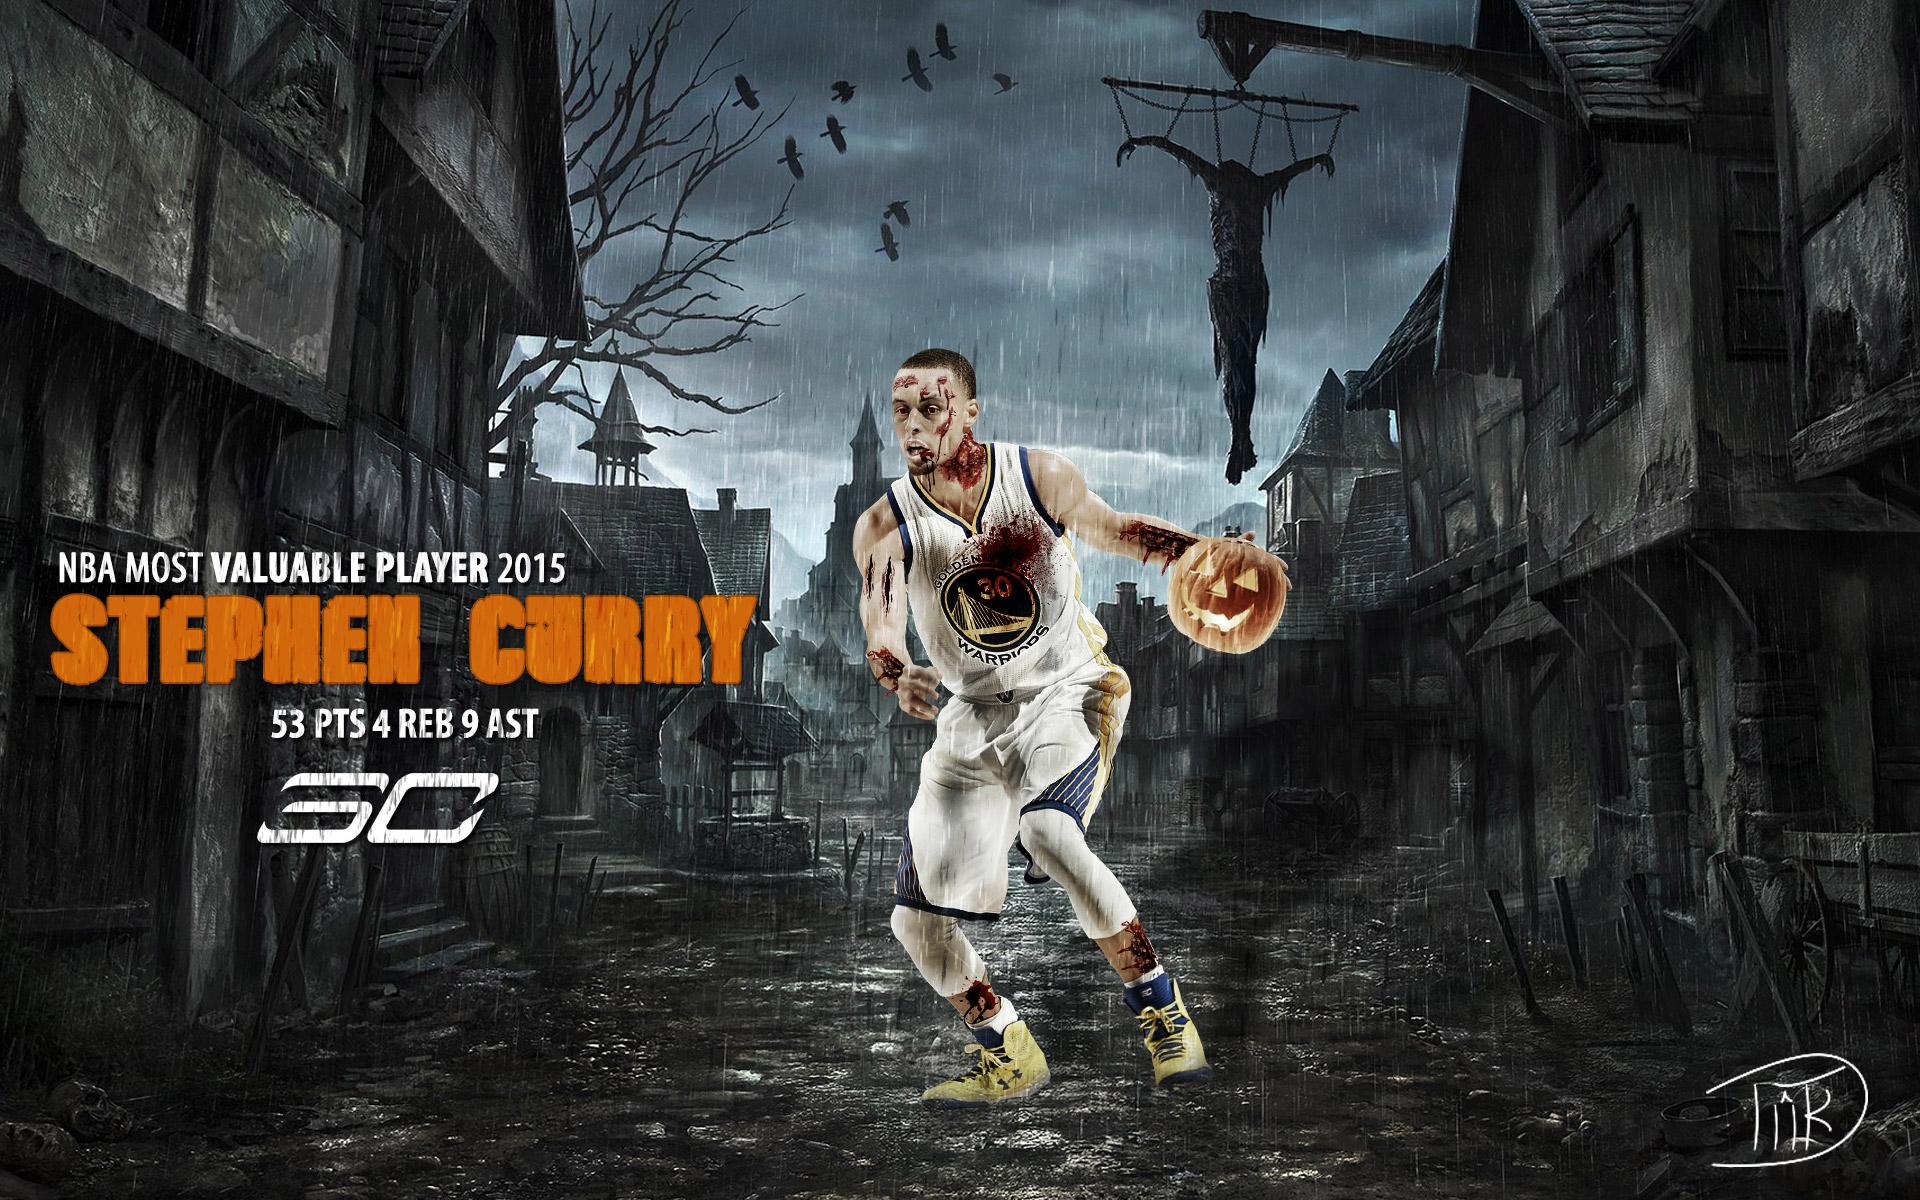 Stephen Curry Halloween 2015 Wallpaper Basketball Wallpapers at 1920x1200